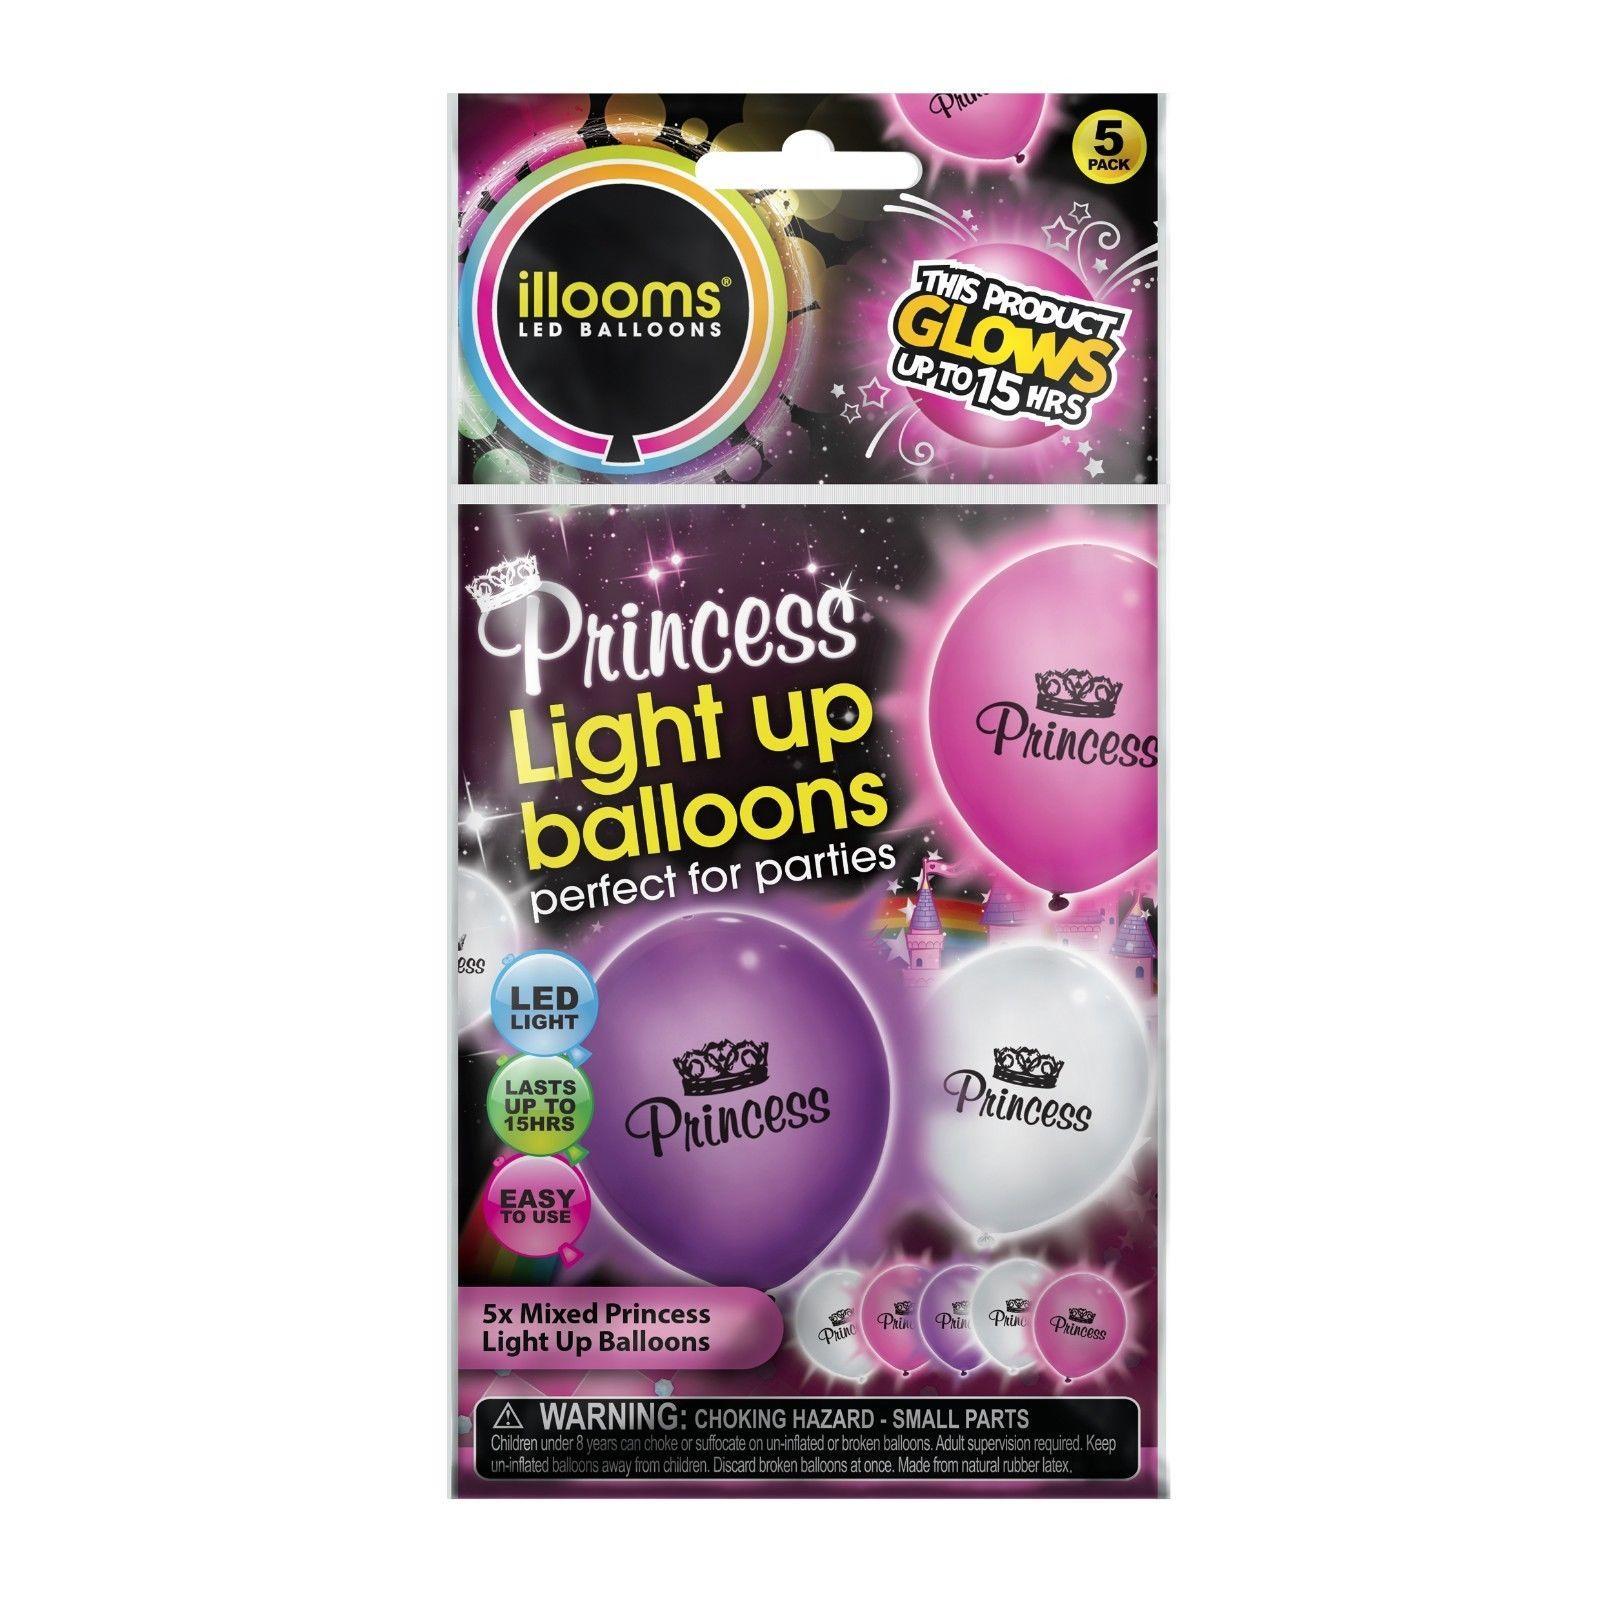 illooms Princess LED Light Up Balloon 15 Pack Birthday Party Balloon